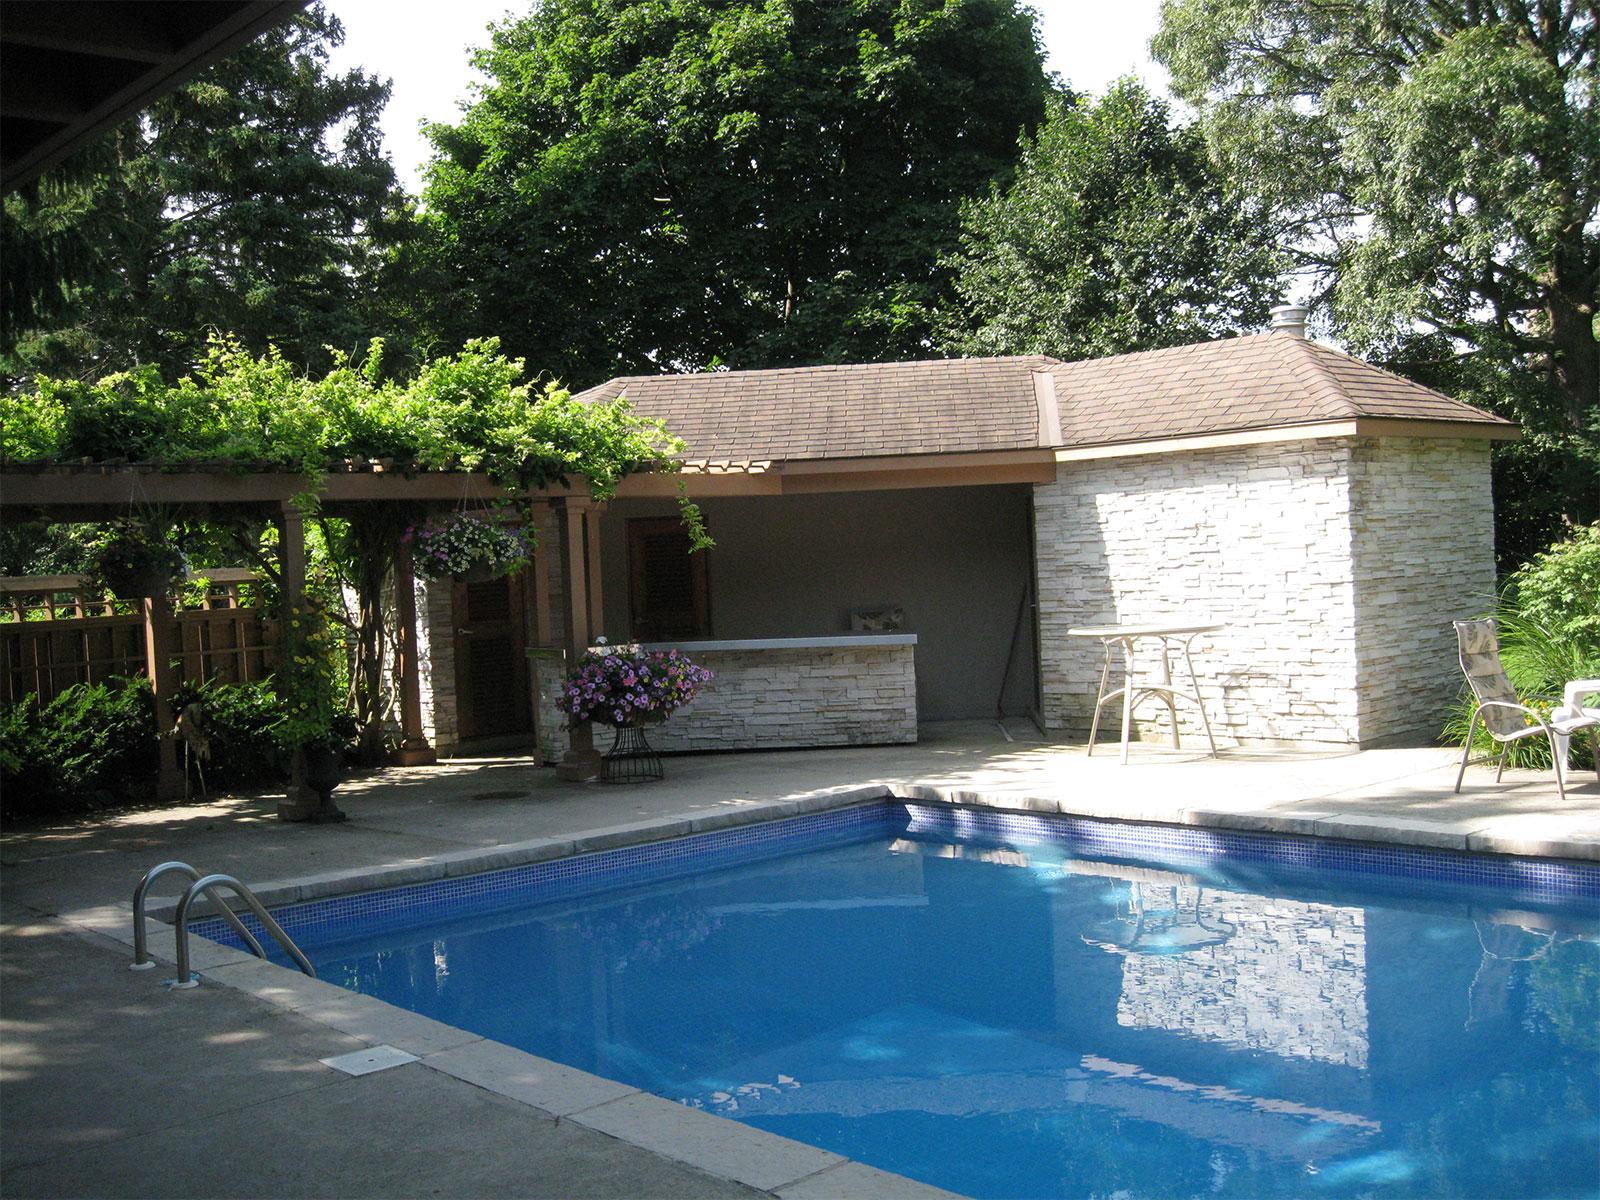 Pool Cabana - Arbor